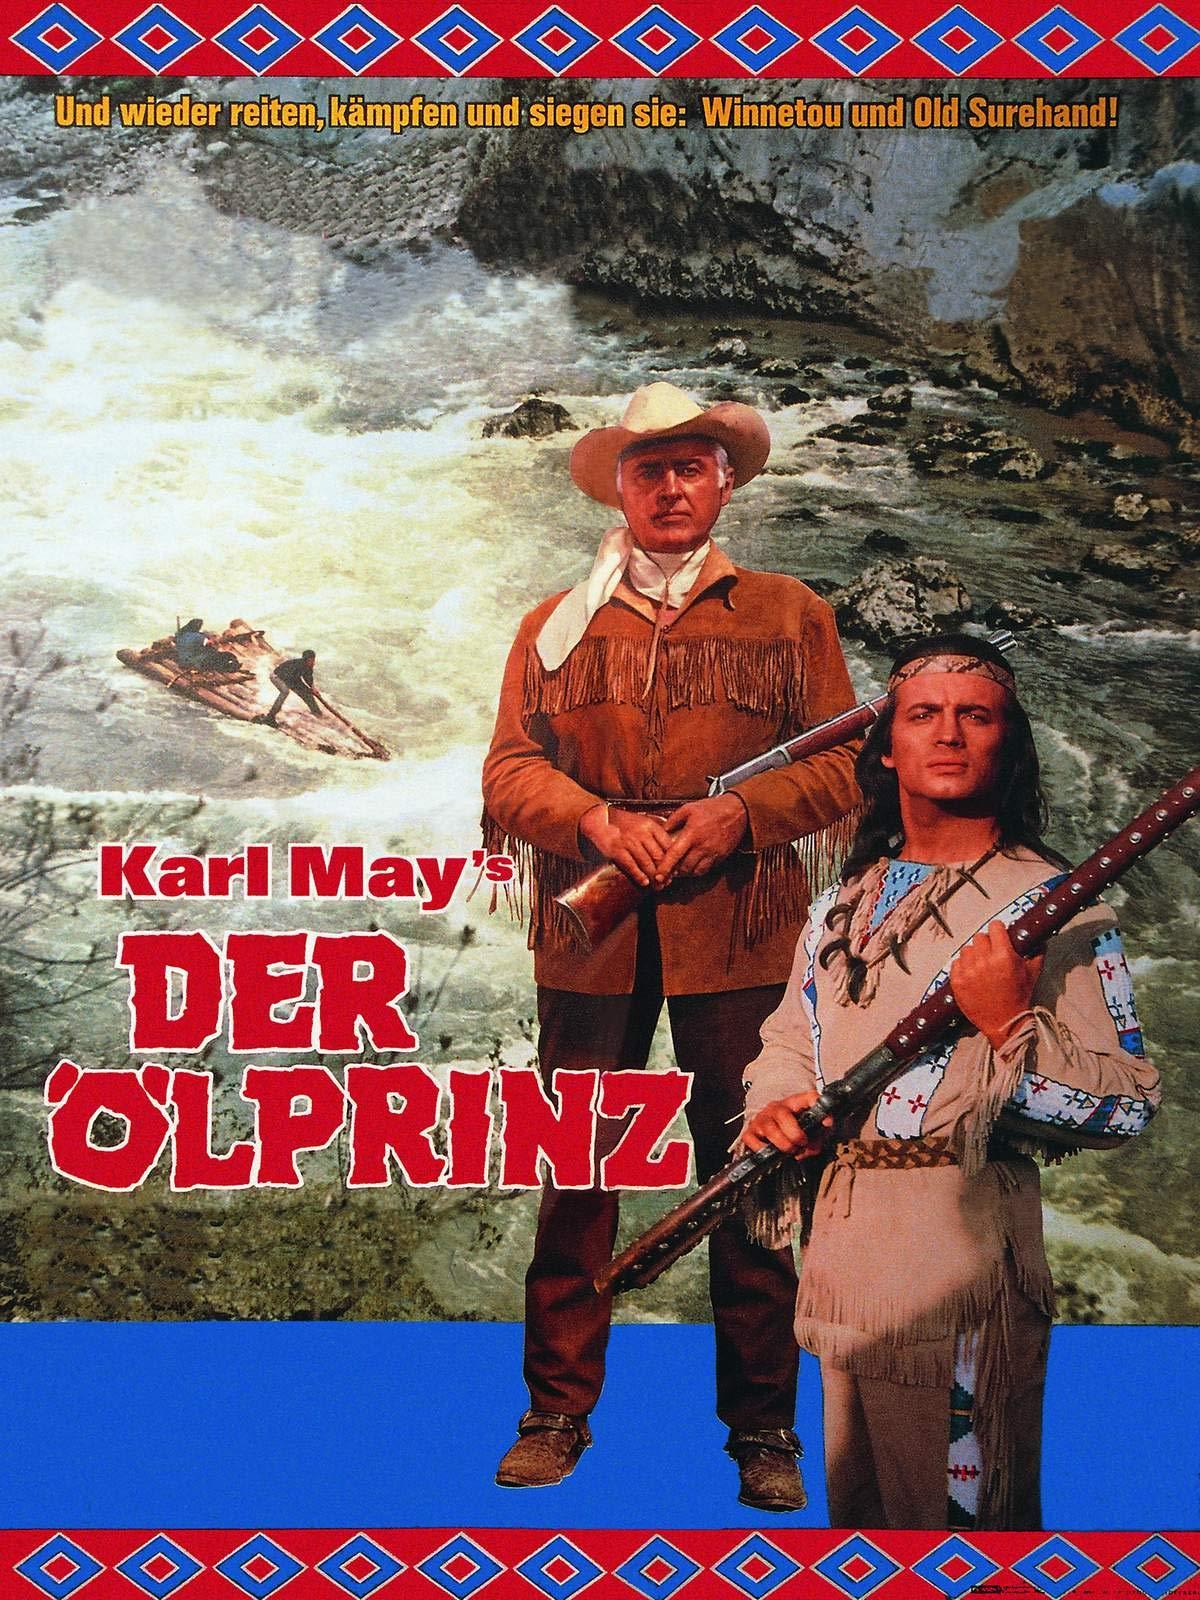 Amazon.de: Karl May: Der Ölprinz ansehen | Prime Video